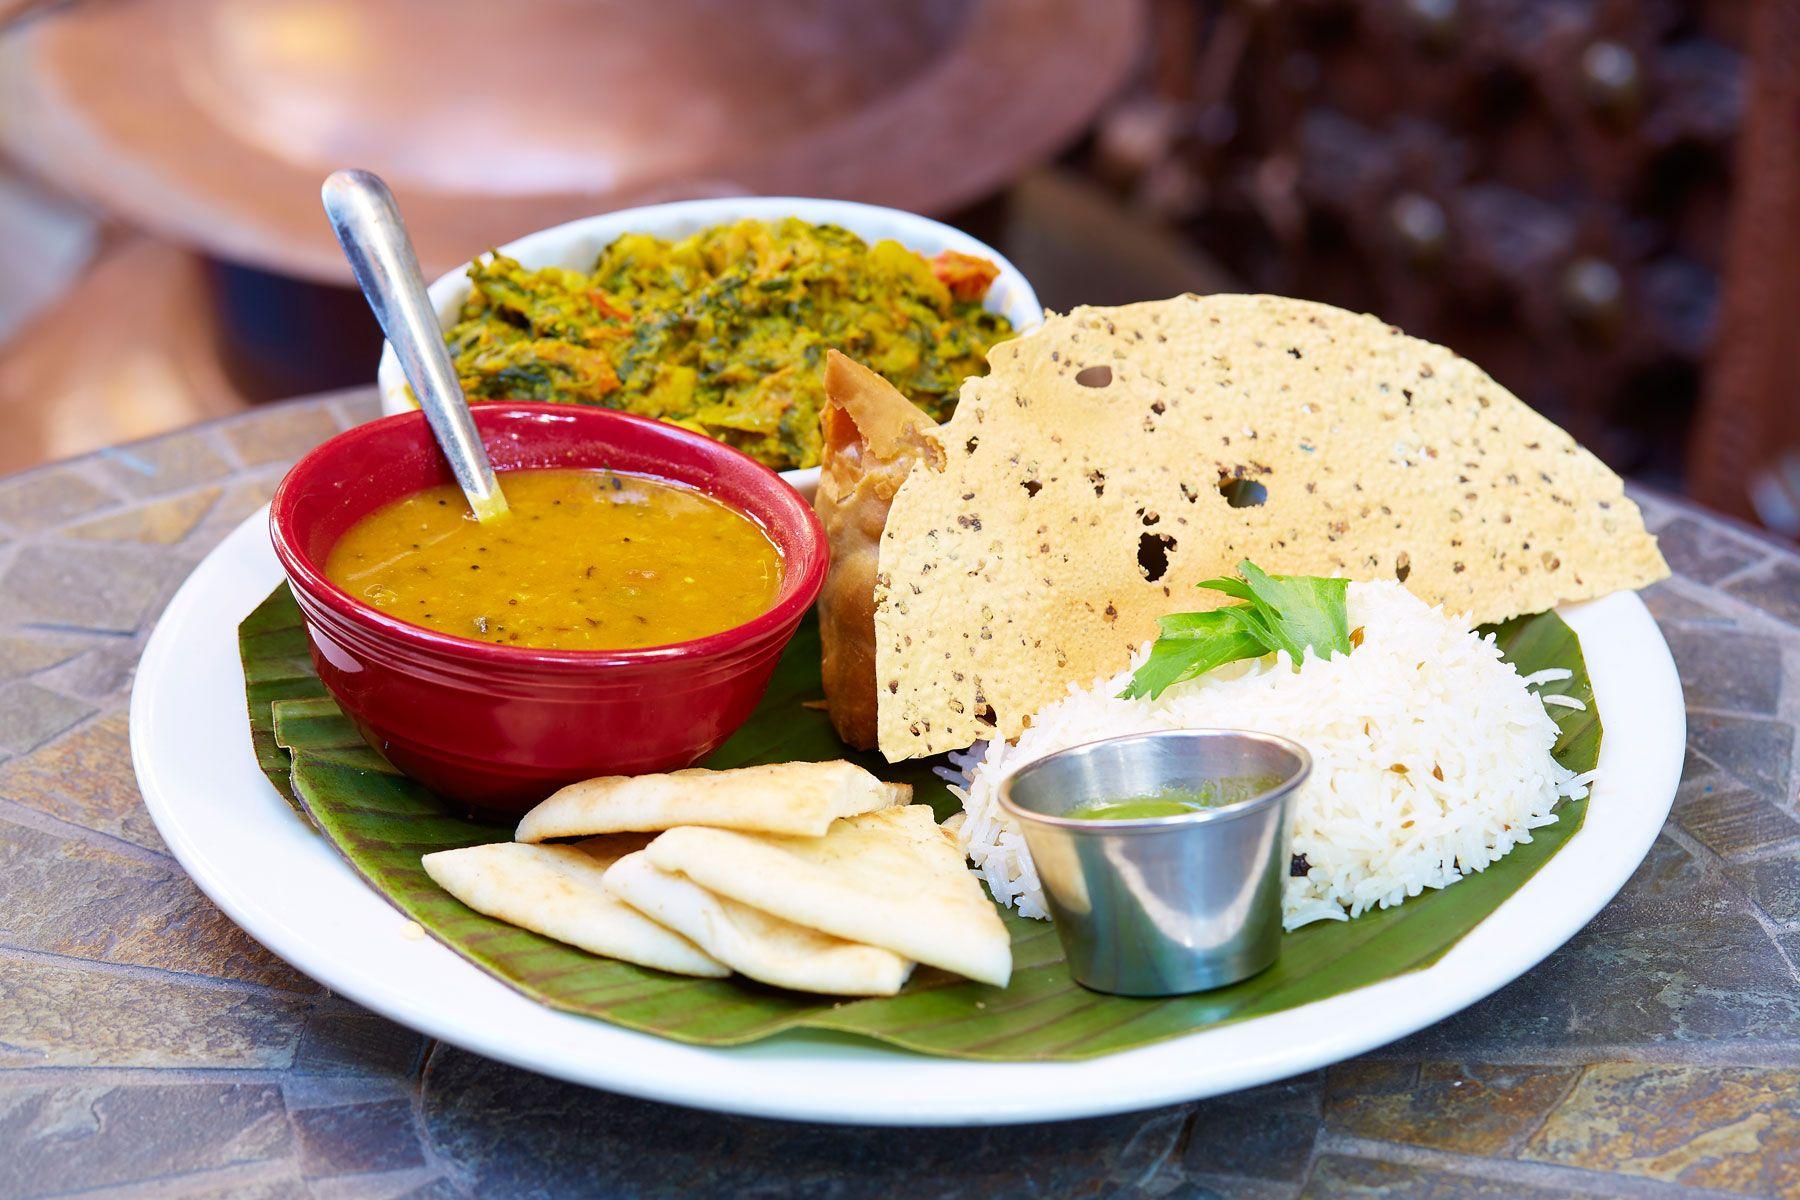 The Best Vegetarian Friendly Restaurants In Dallas Best Vegetarian Restaurants Veggie Restaurant Vegetarian Friendly Restaurants